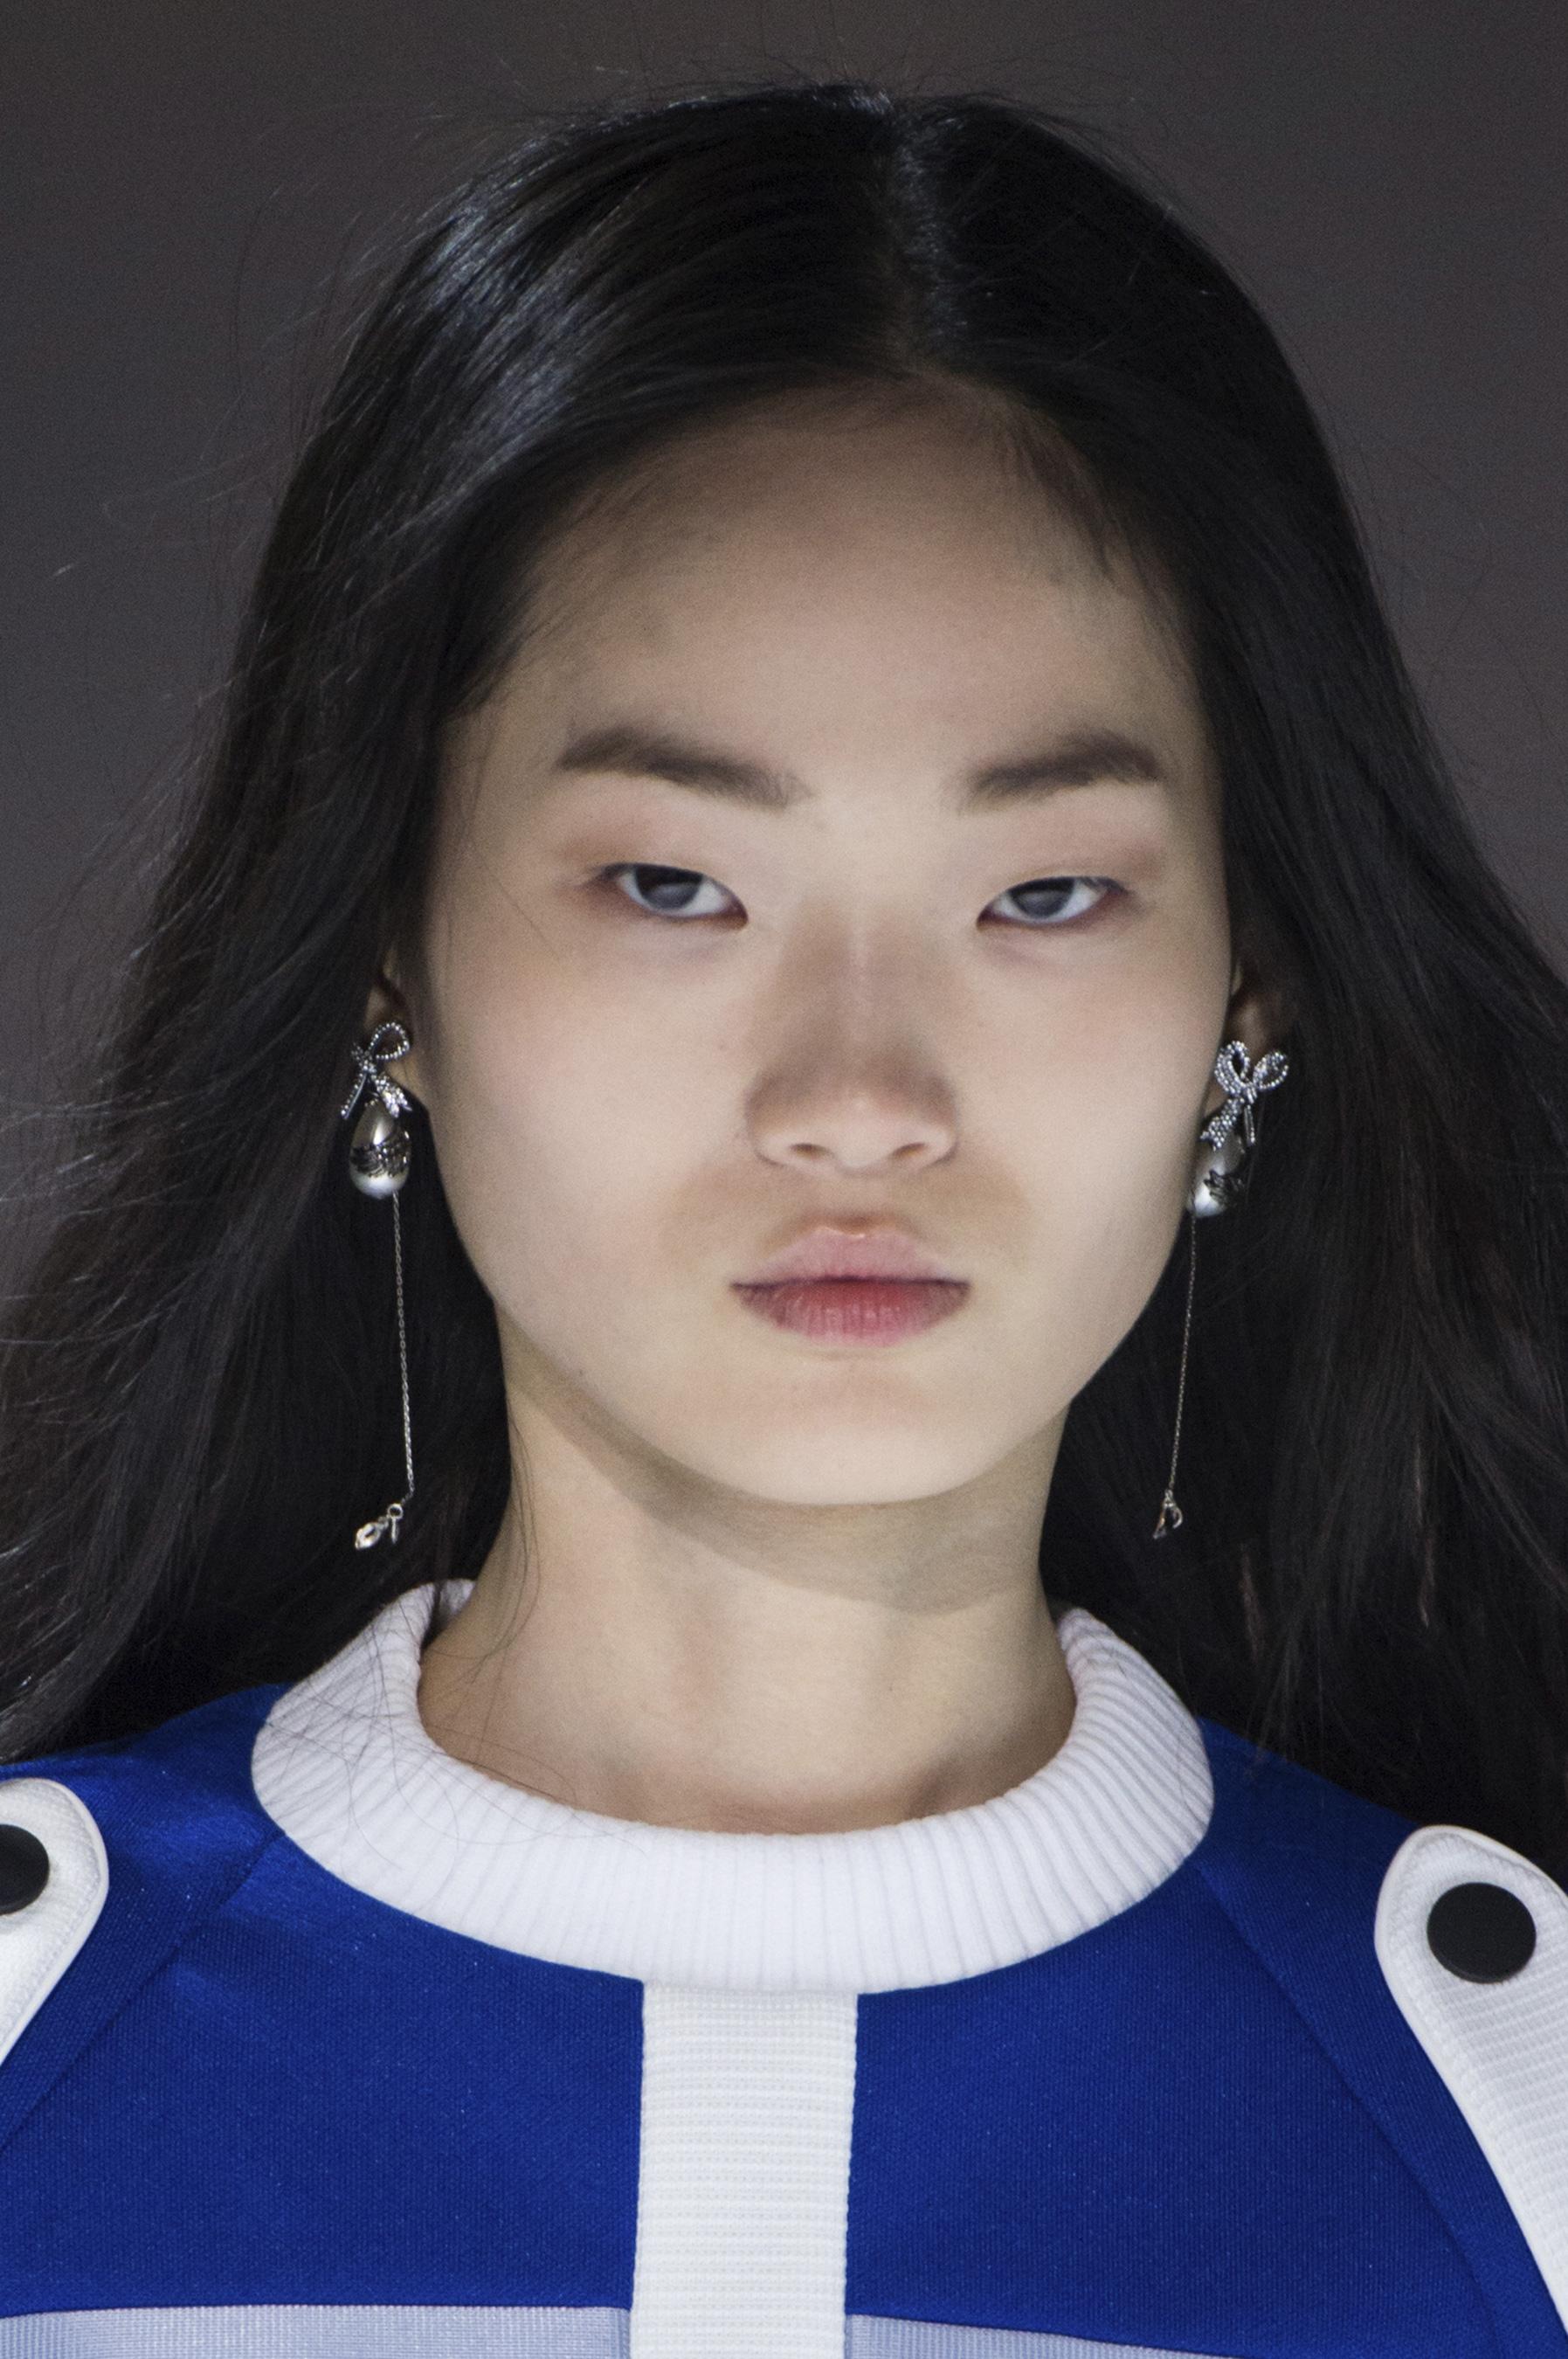 Video Hyun Ji Shin nude photos 2019